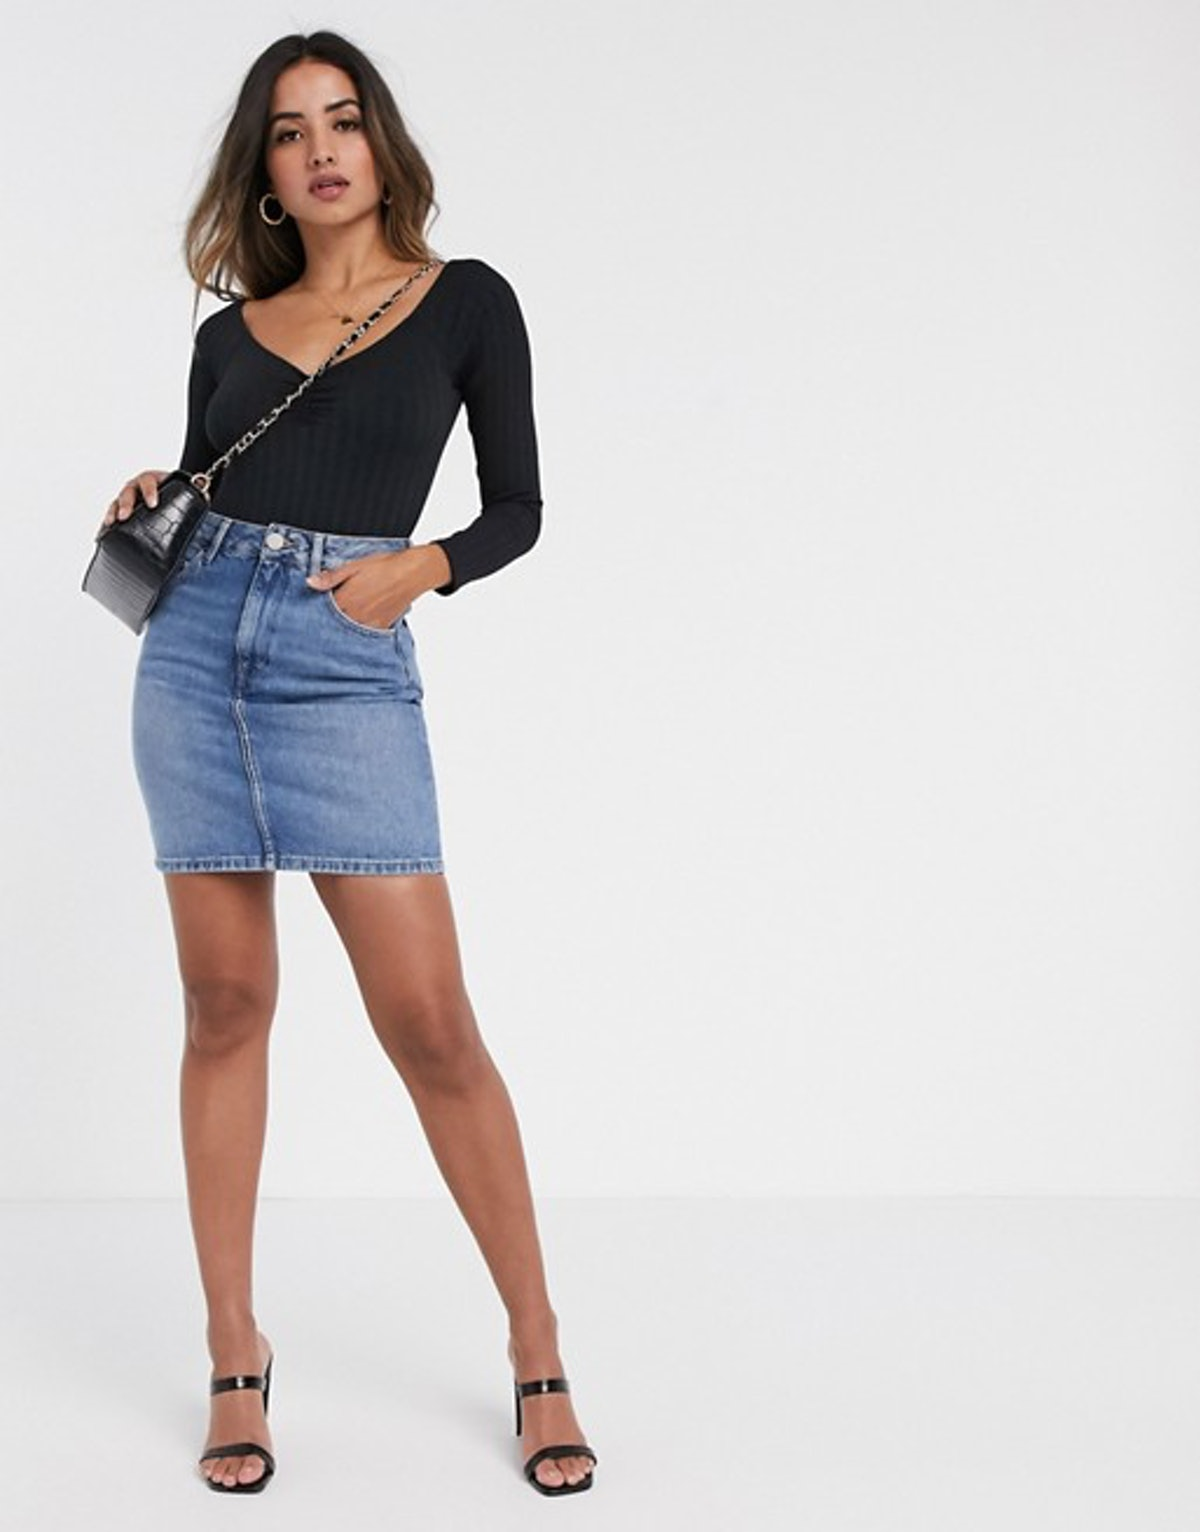 ASOS Design Denim Original High Waisted Skirt in Stonewash Blue